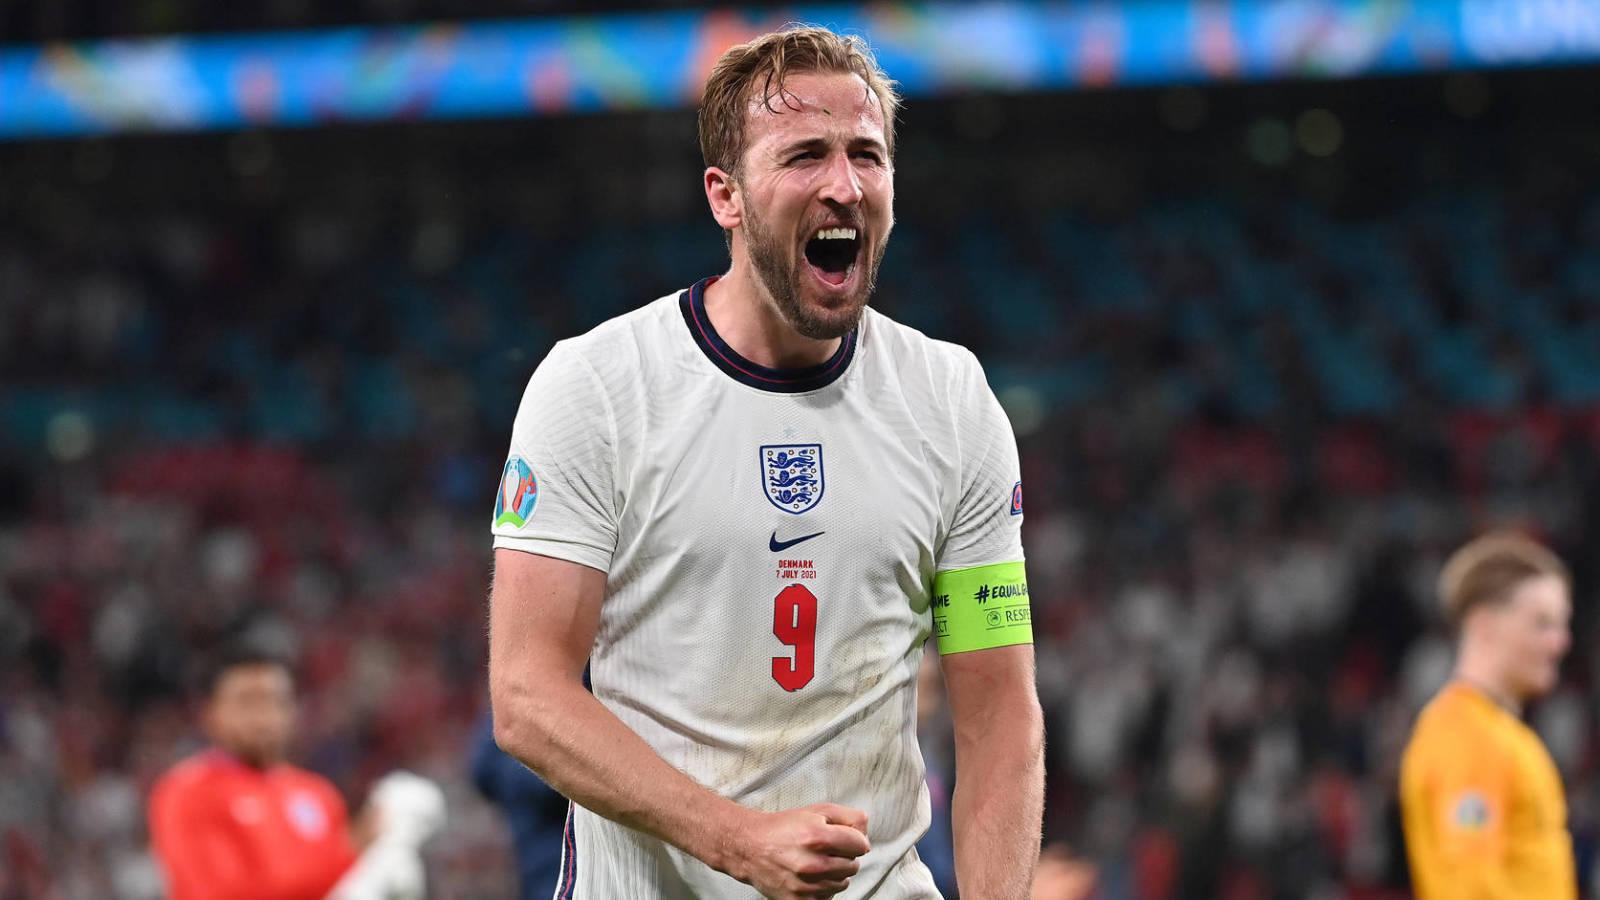 Kane denies missing training, promises to report Saturday